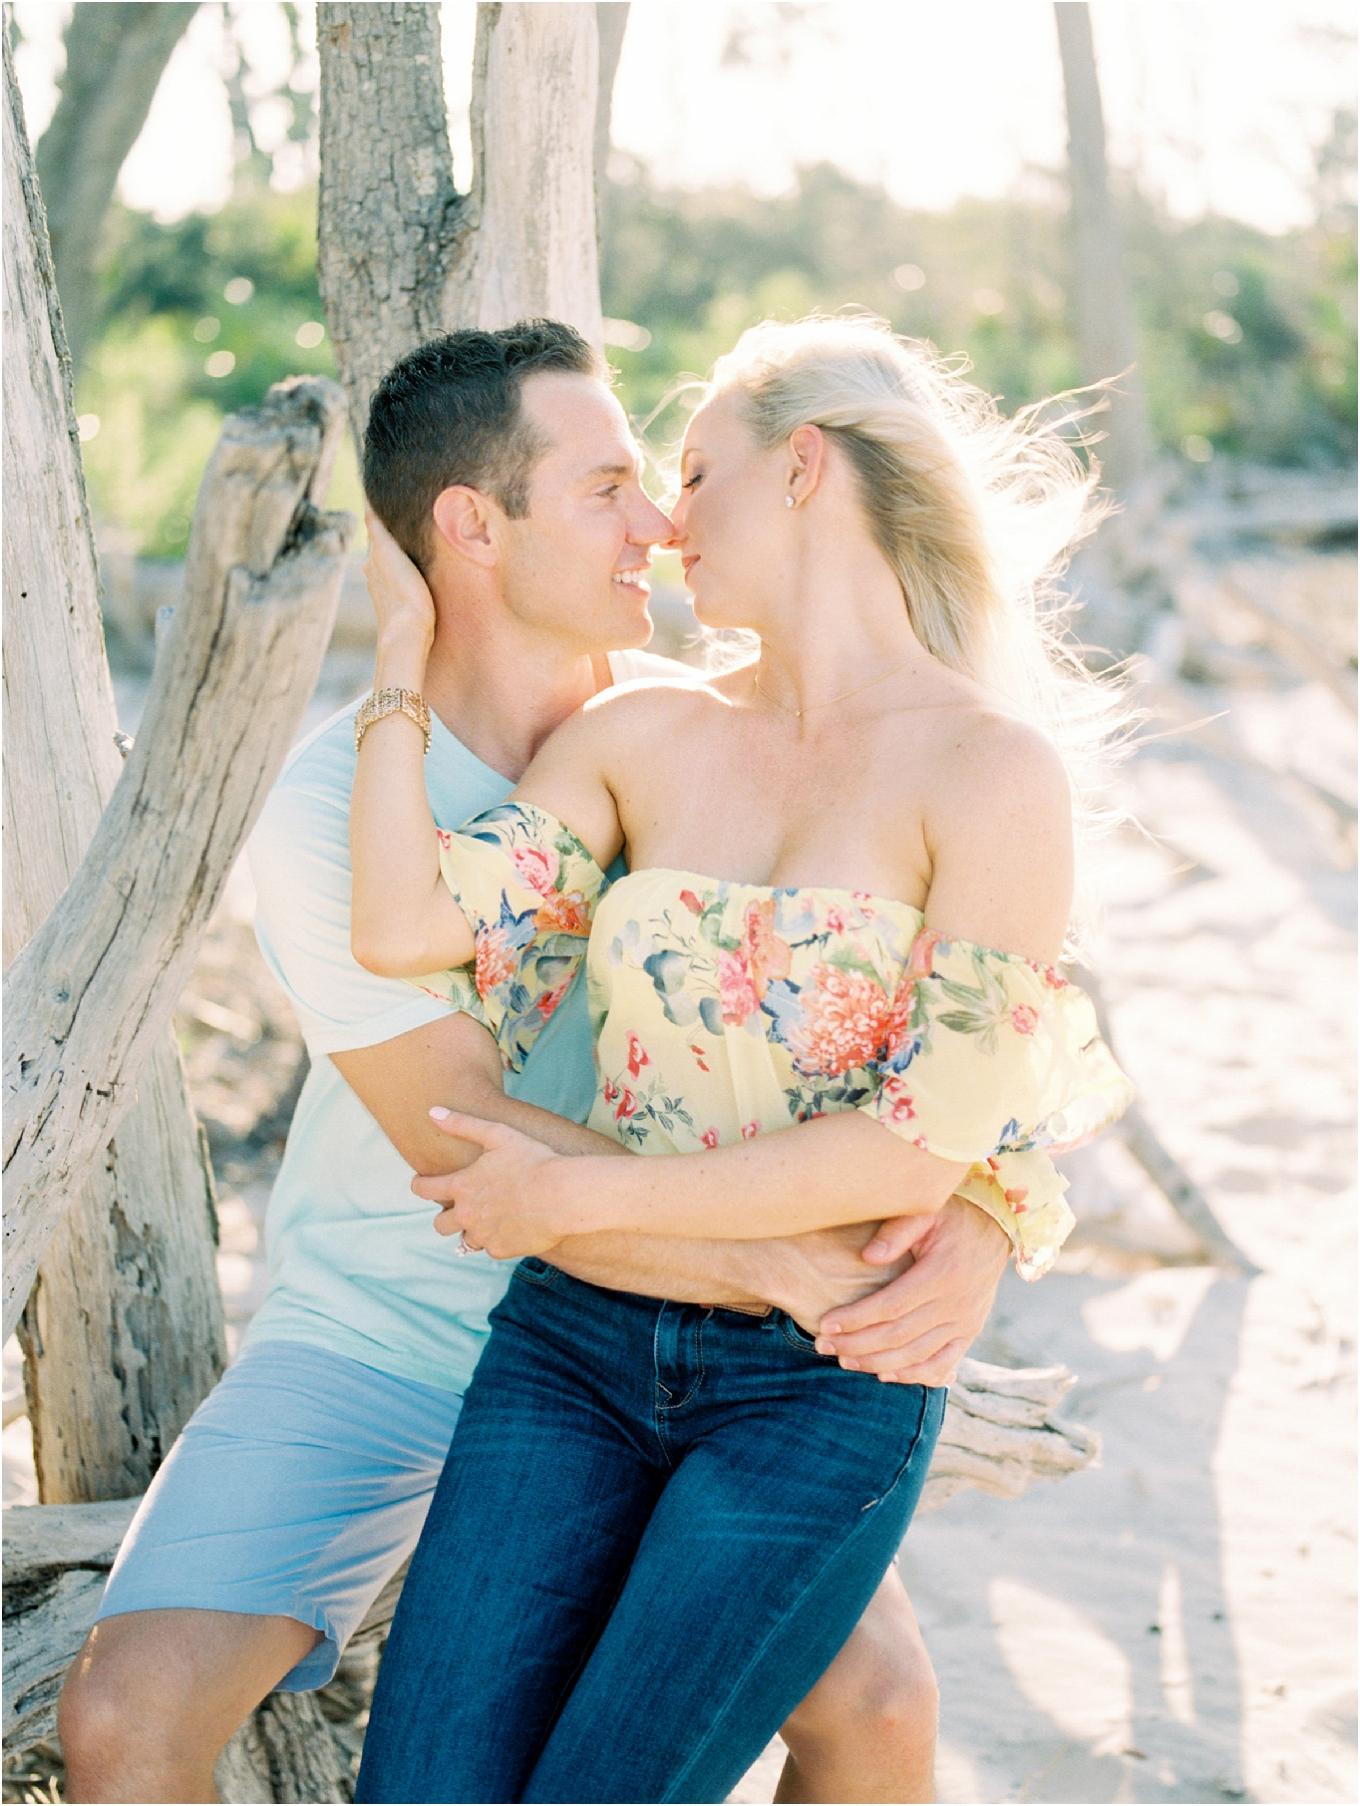 Lisa Silva Photography- Ponte Vedra Beach and Jacksonville, Florida Fine Art Film Wedding Photography- Engagement Shoot at Big Talbot Island_0002.jpg